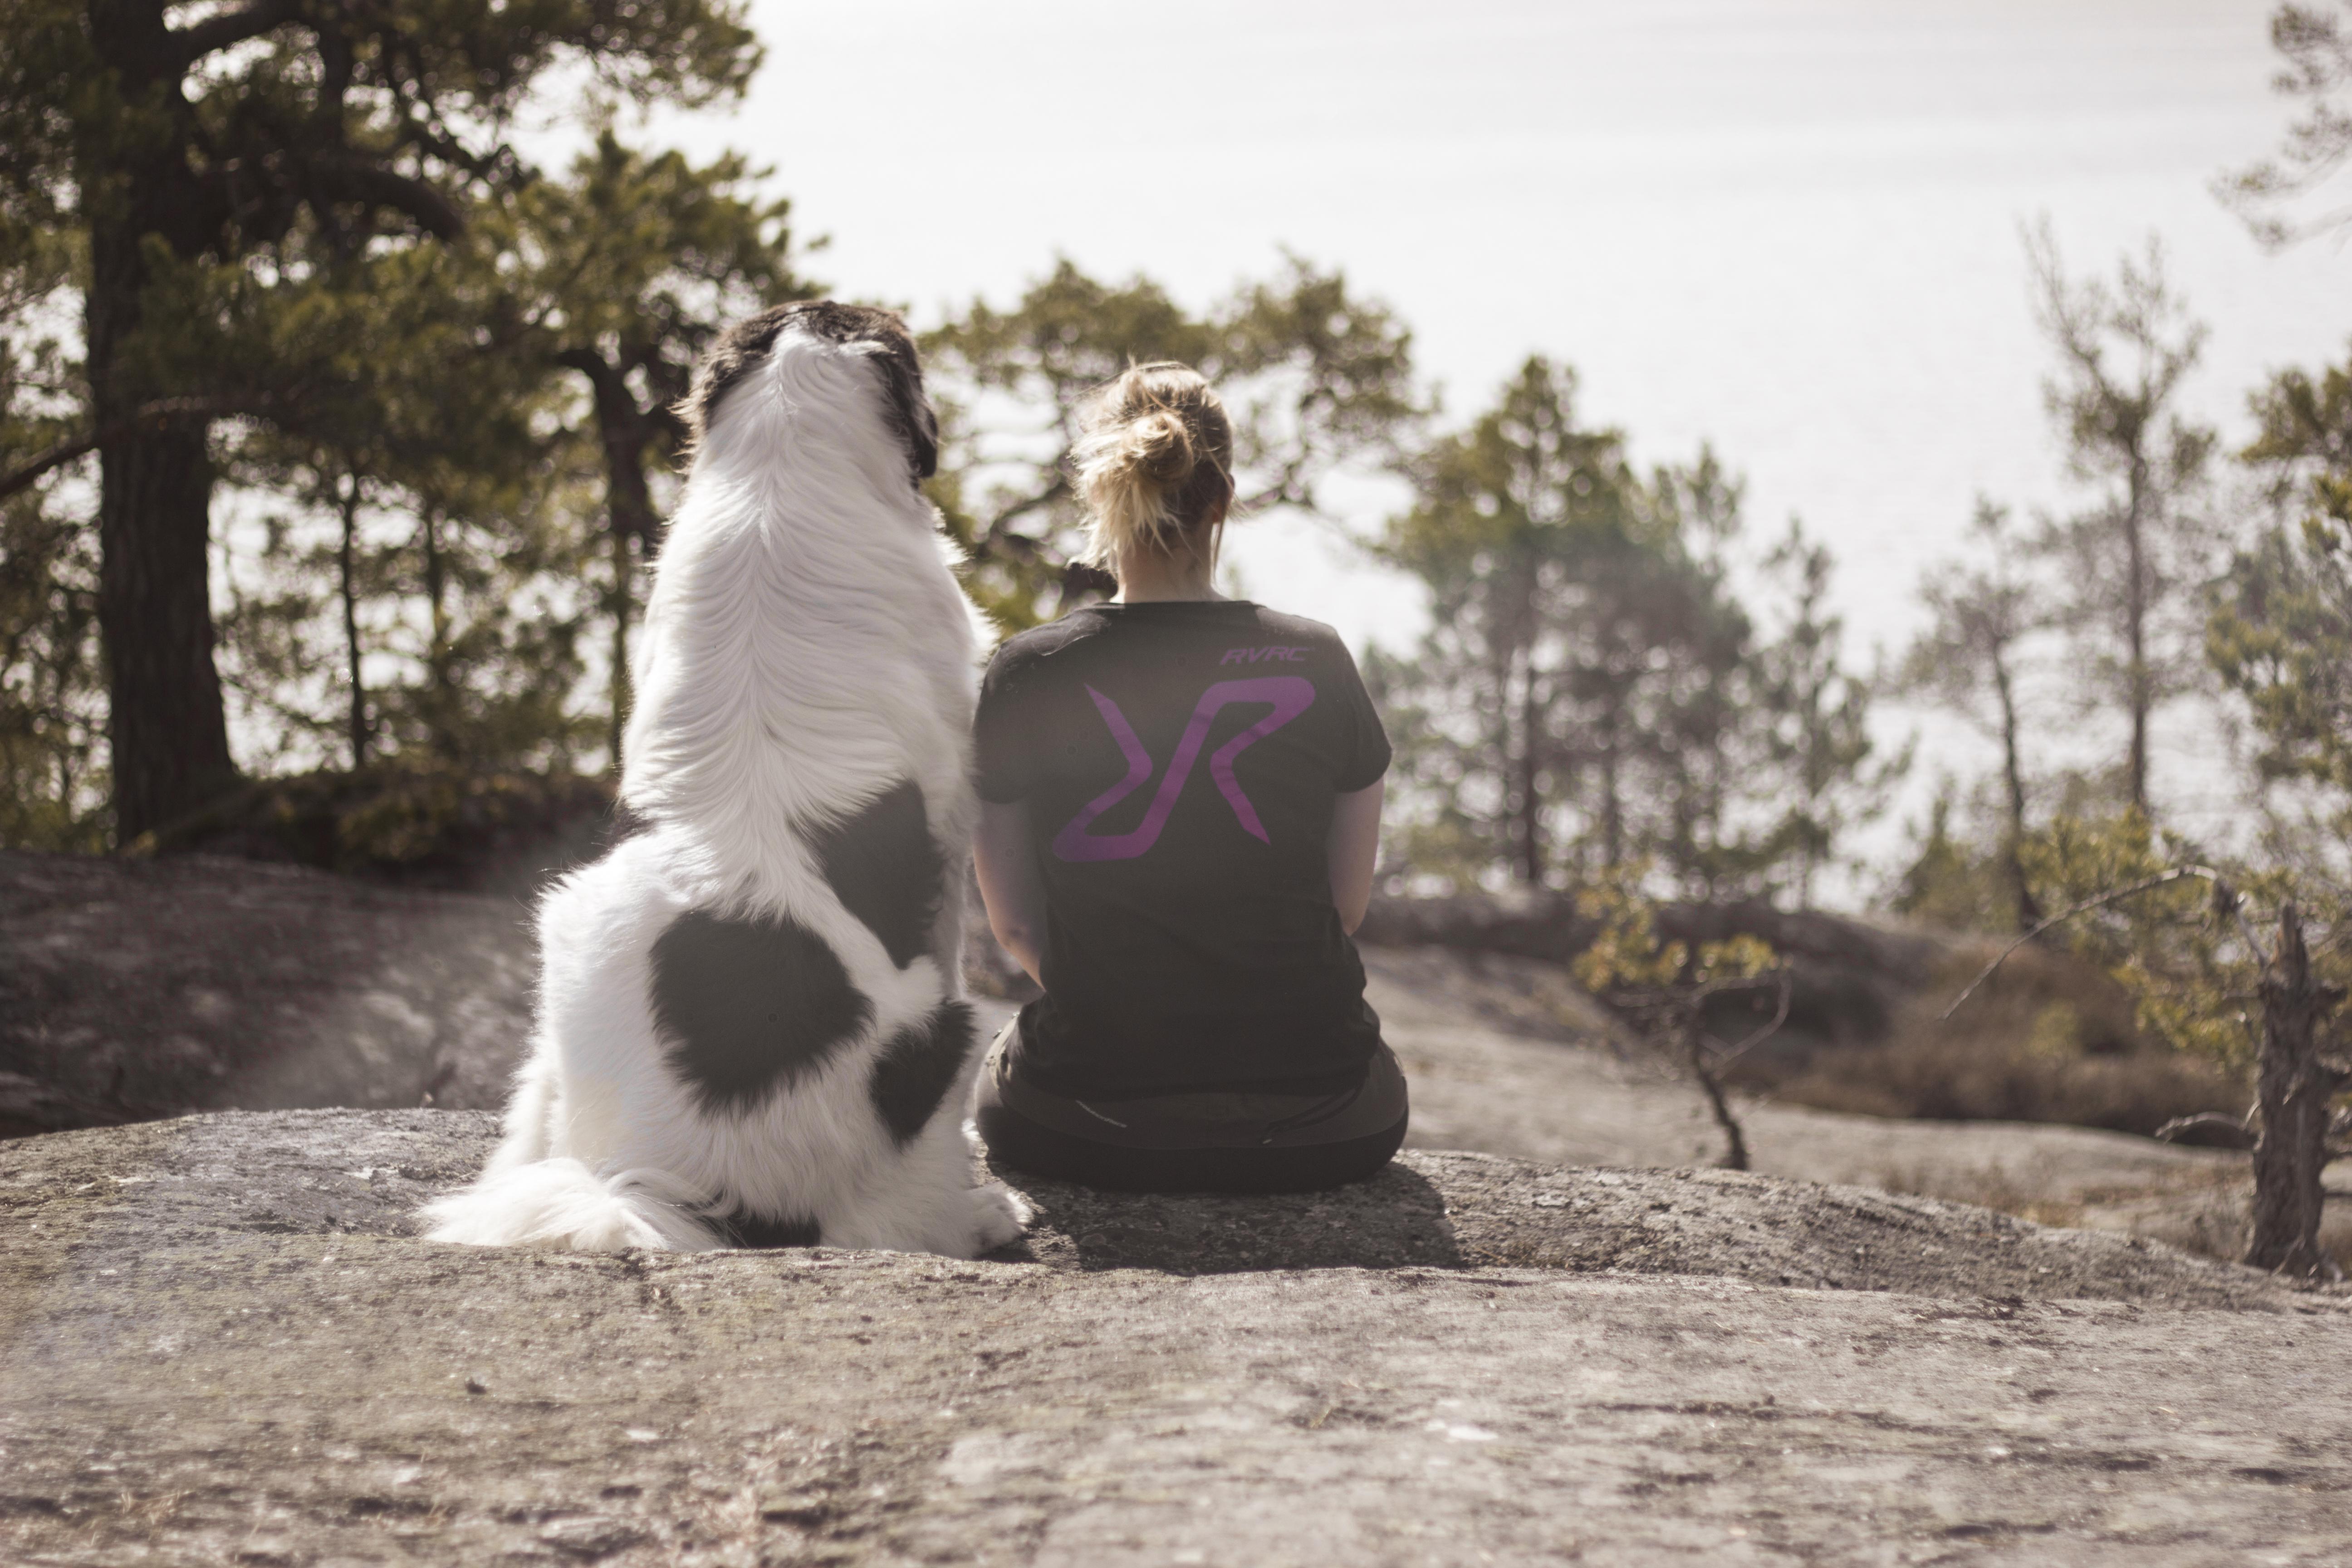 hundenshark_amazingdogshark_landseer_amazingdog1